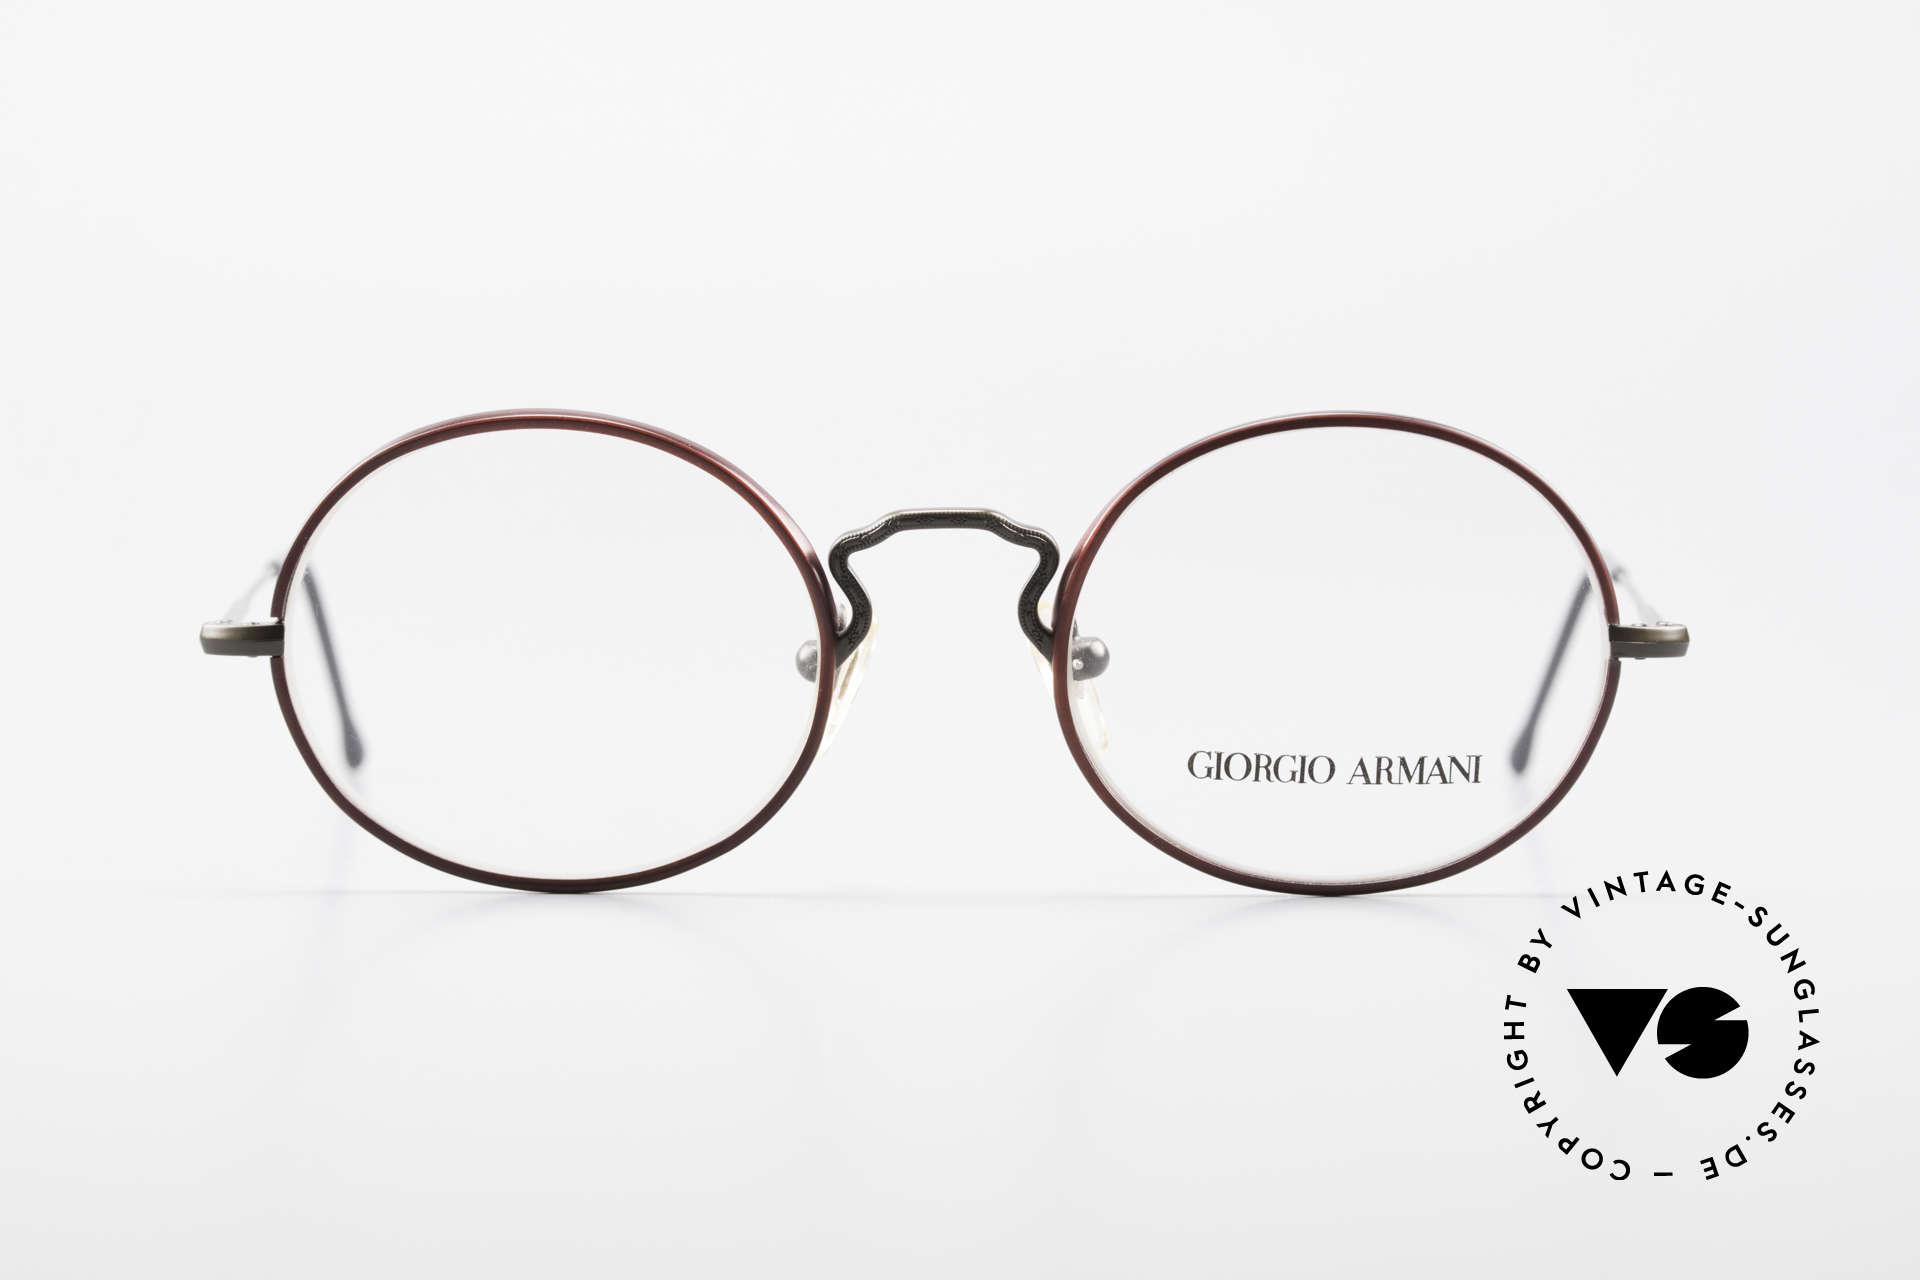 Giorgio Armani 247 Oval 90's Eyeglasses No Retro, oval frame design; M size 49/20 - a timeless classic!, Made for Men and Women